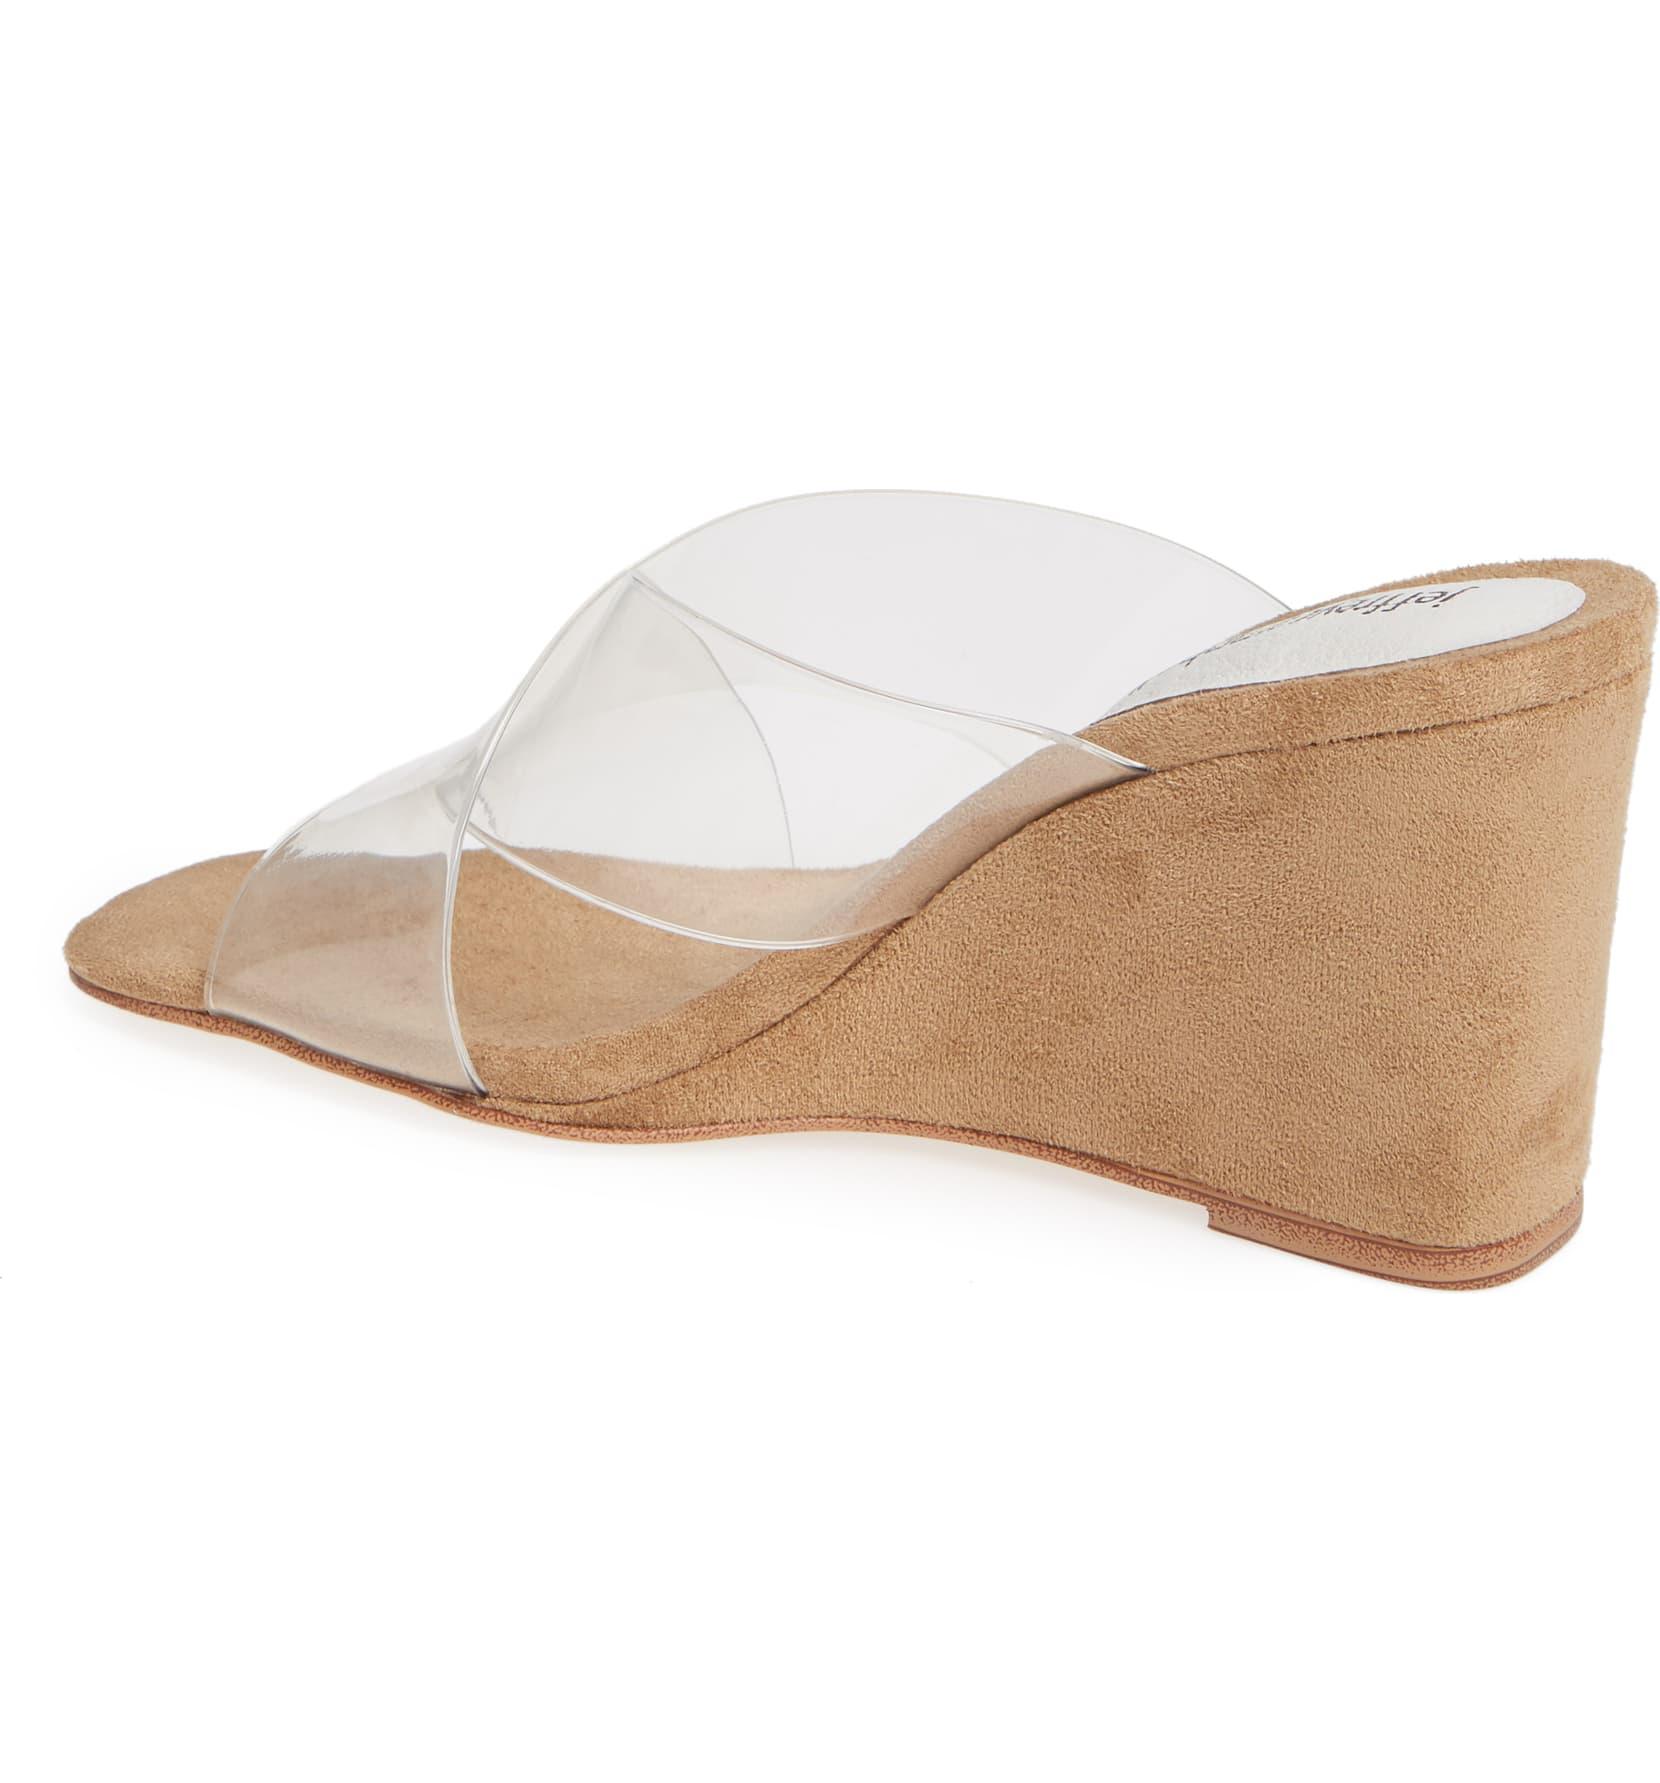 Jeffrey-Campbell-Women-039-s-Mystical-Wedge-Transparent-Straps-Wedge-Heeled-Sandals thumbnail 3